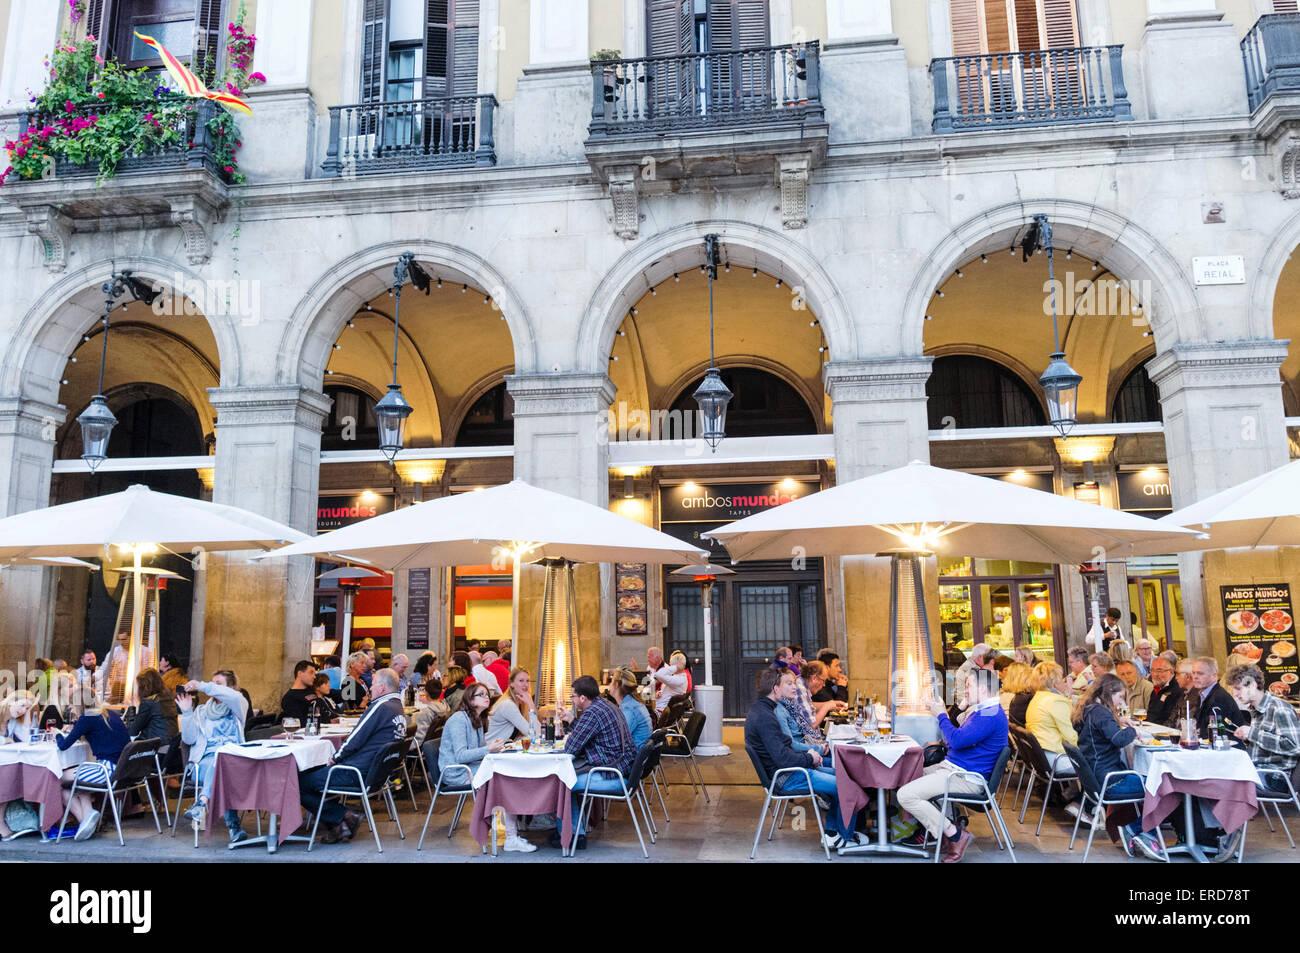 Restaurant at Plaça Reial, Gothic quarter, Barcelona, Spain - Stock Image